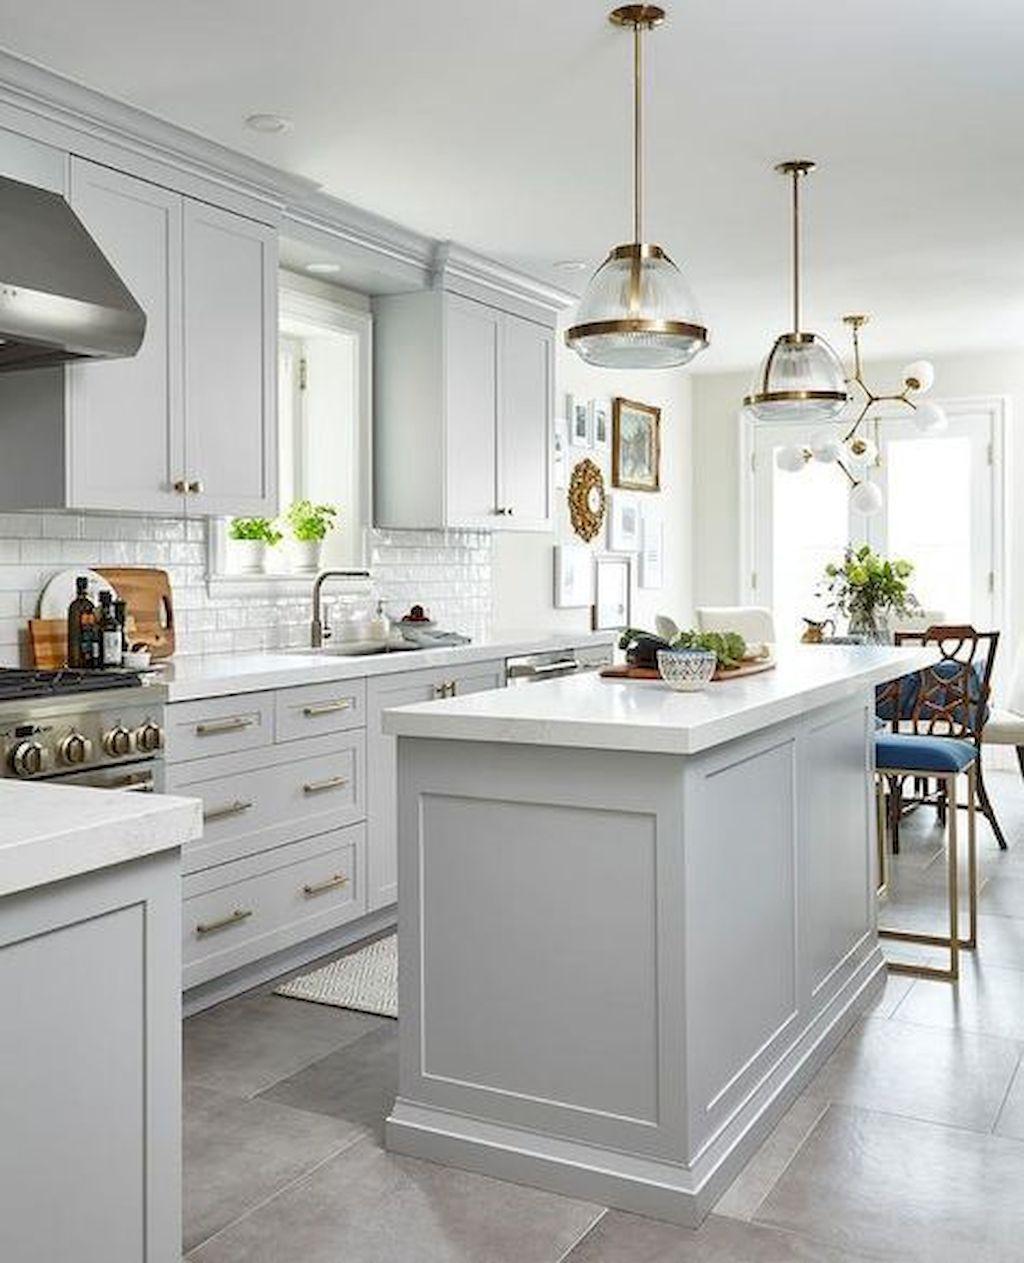 How To Make Best White Kitchen Shairoom Com White Kitchen Design Kitchen Concepts Kitchen Design